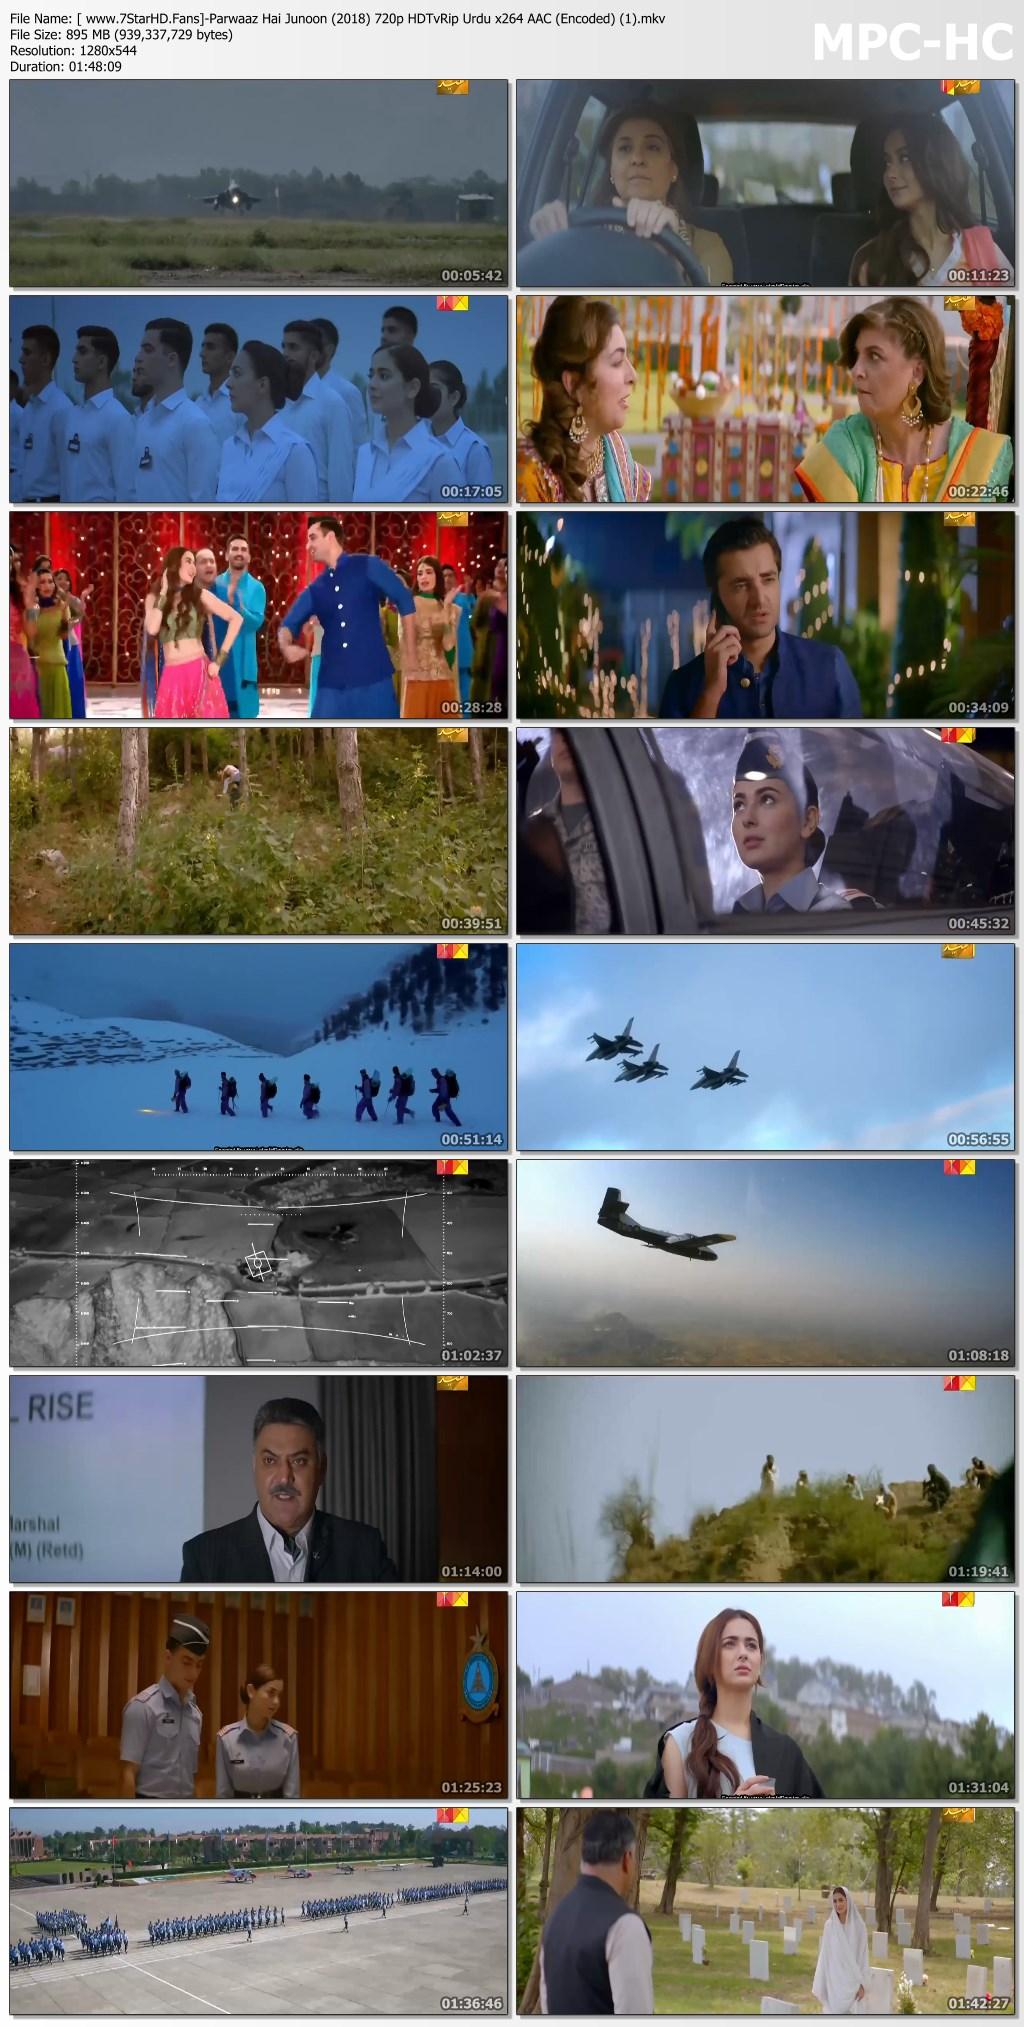 Parwaaz Hai Junoon (2018) Urdu/Hindi HDTV 480p & 720p   GDRive 1